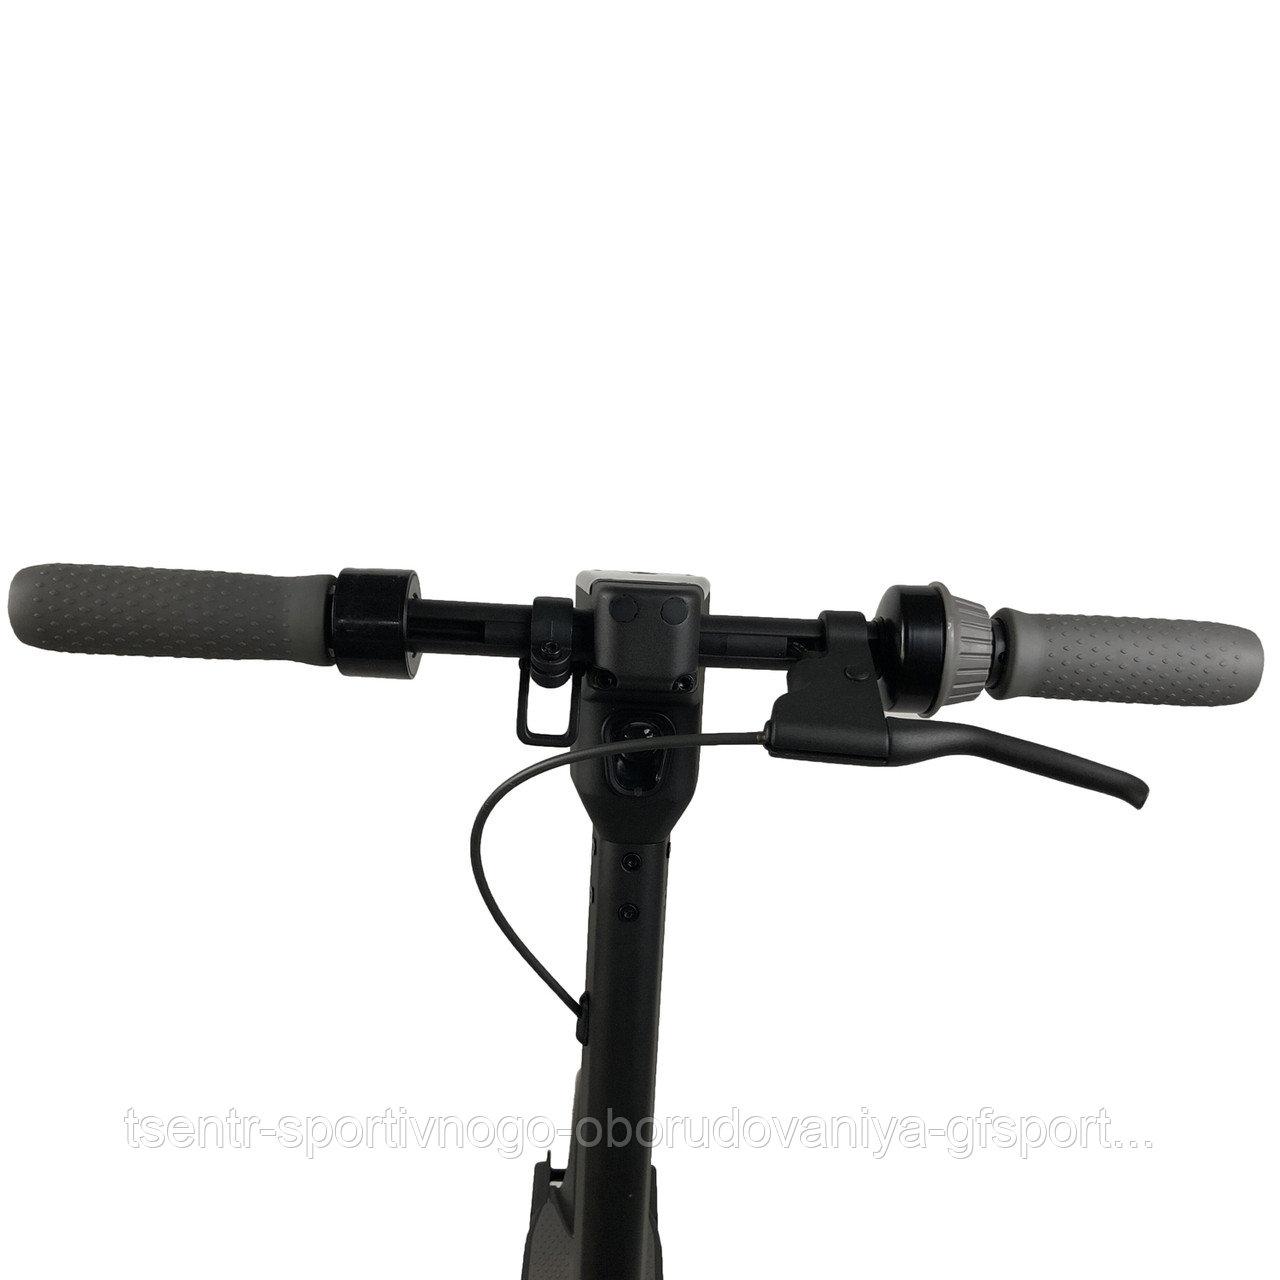 Электросамокат GF-Scooter Max RR-30 - фото 2